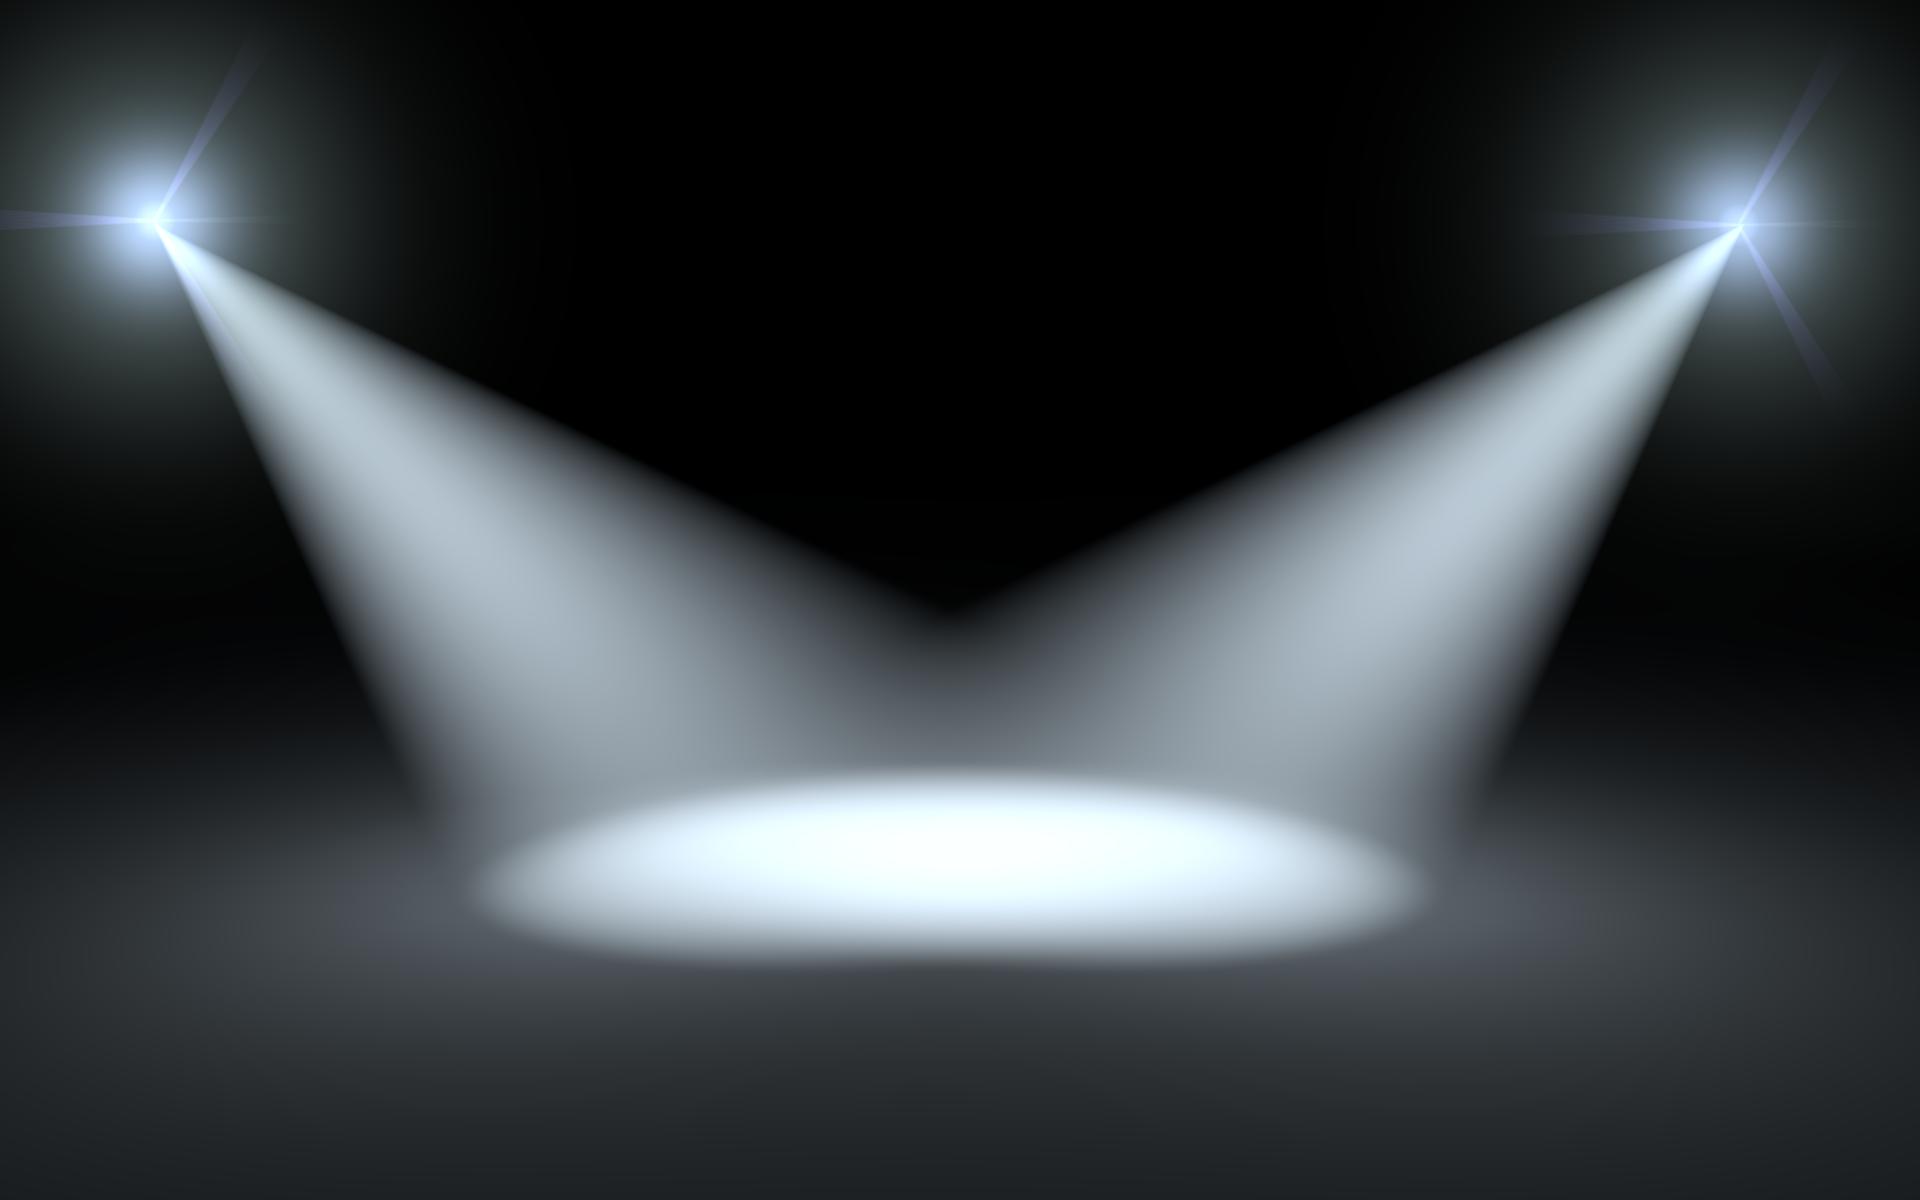 Spotlights Clip Art Free | Clipart Panda - Free Clipart Images